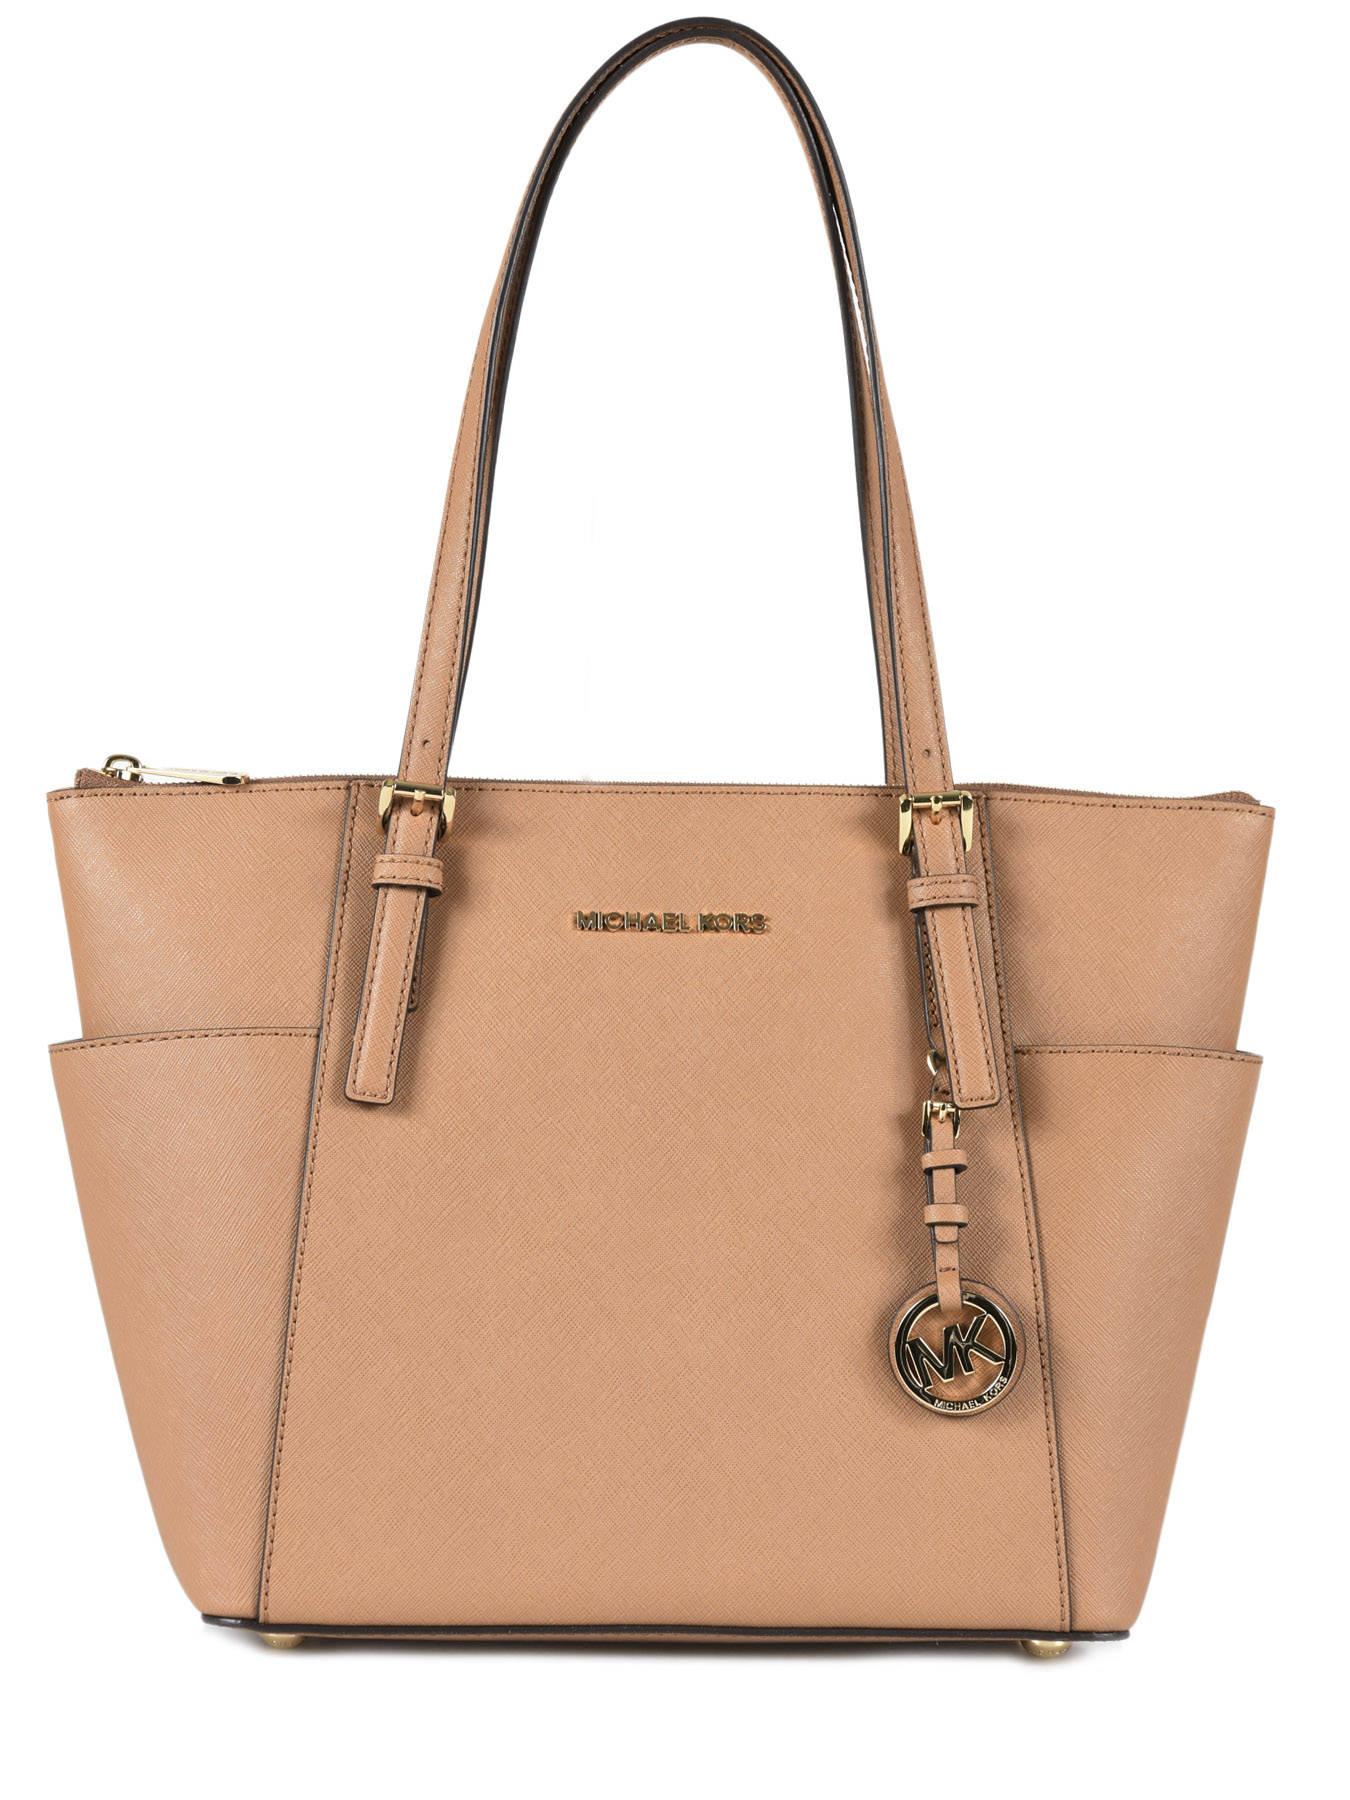 Shopping bag Jet set item leather MICHAEL KORS